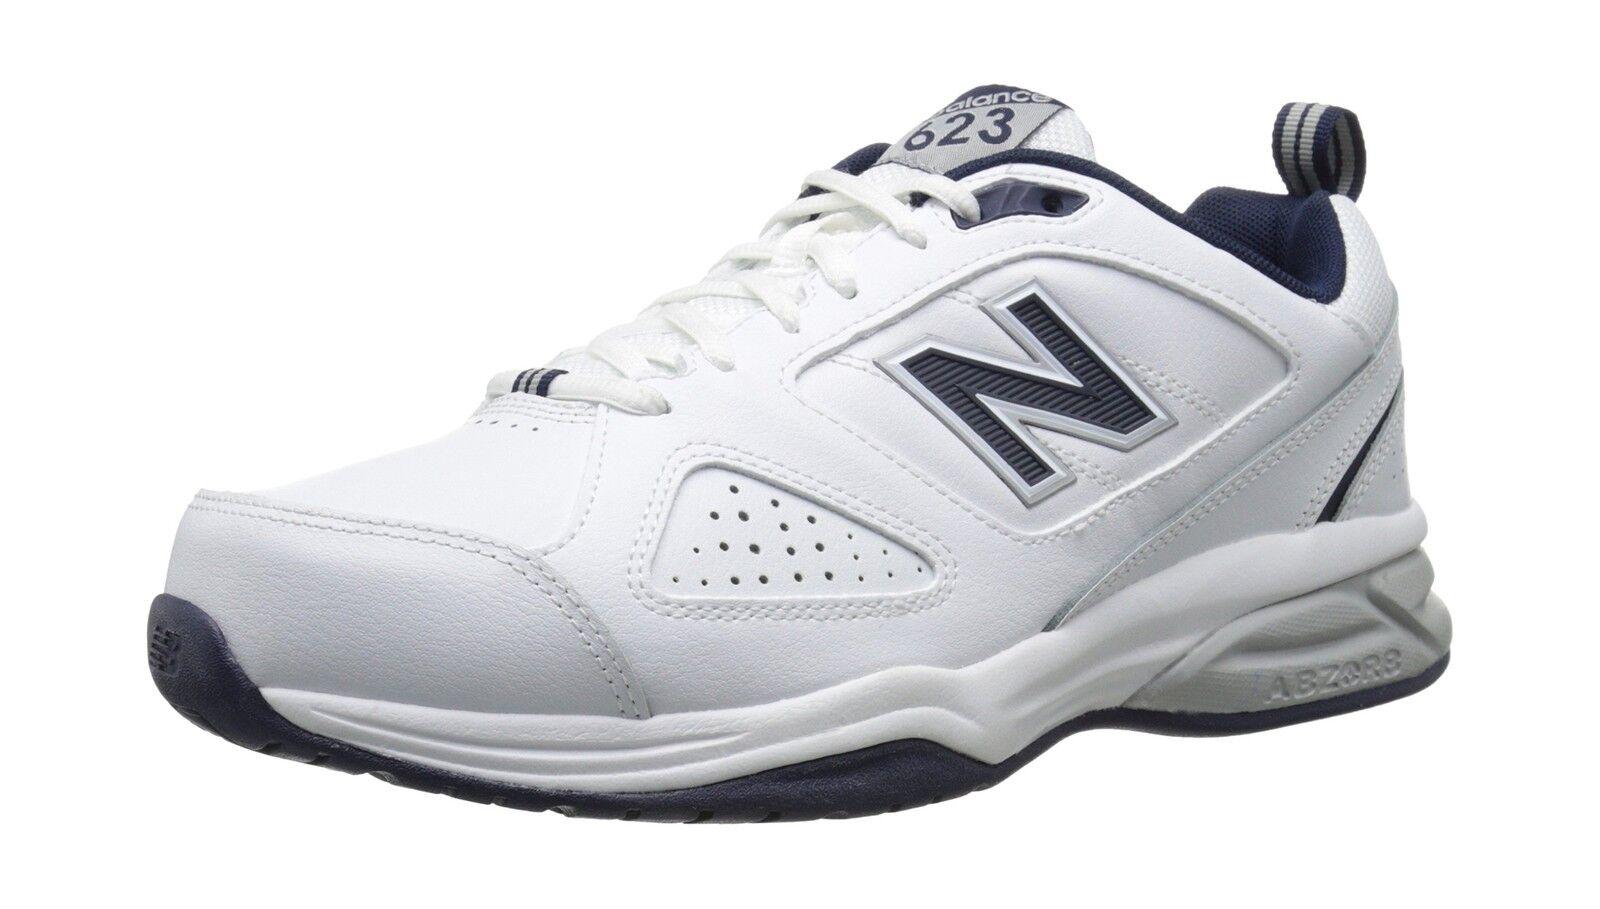 New Balance Men's 623v3 Training shoes White Navy 10 4E US Free Shipping